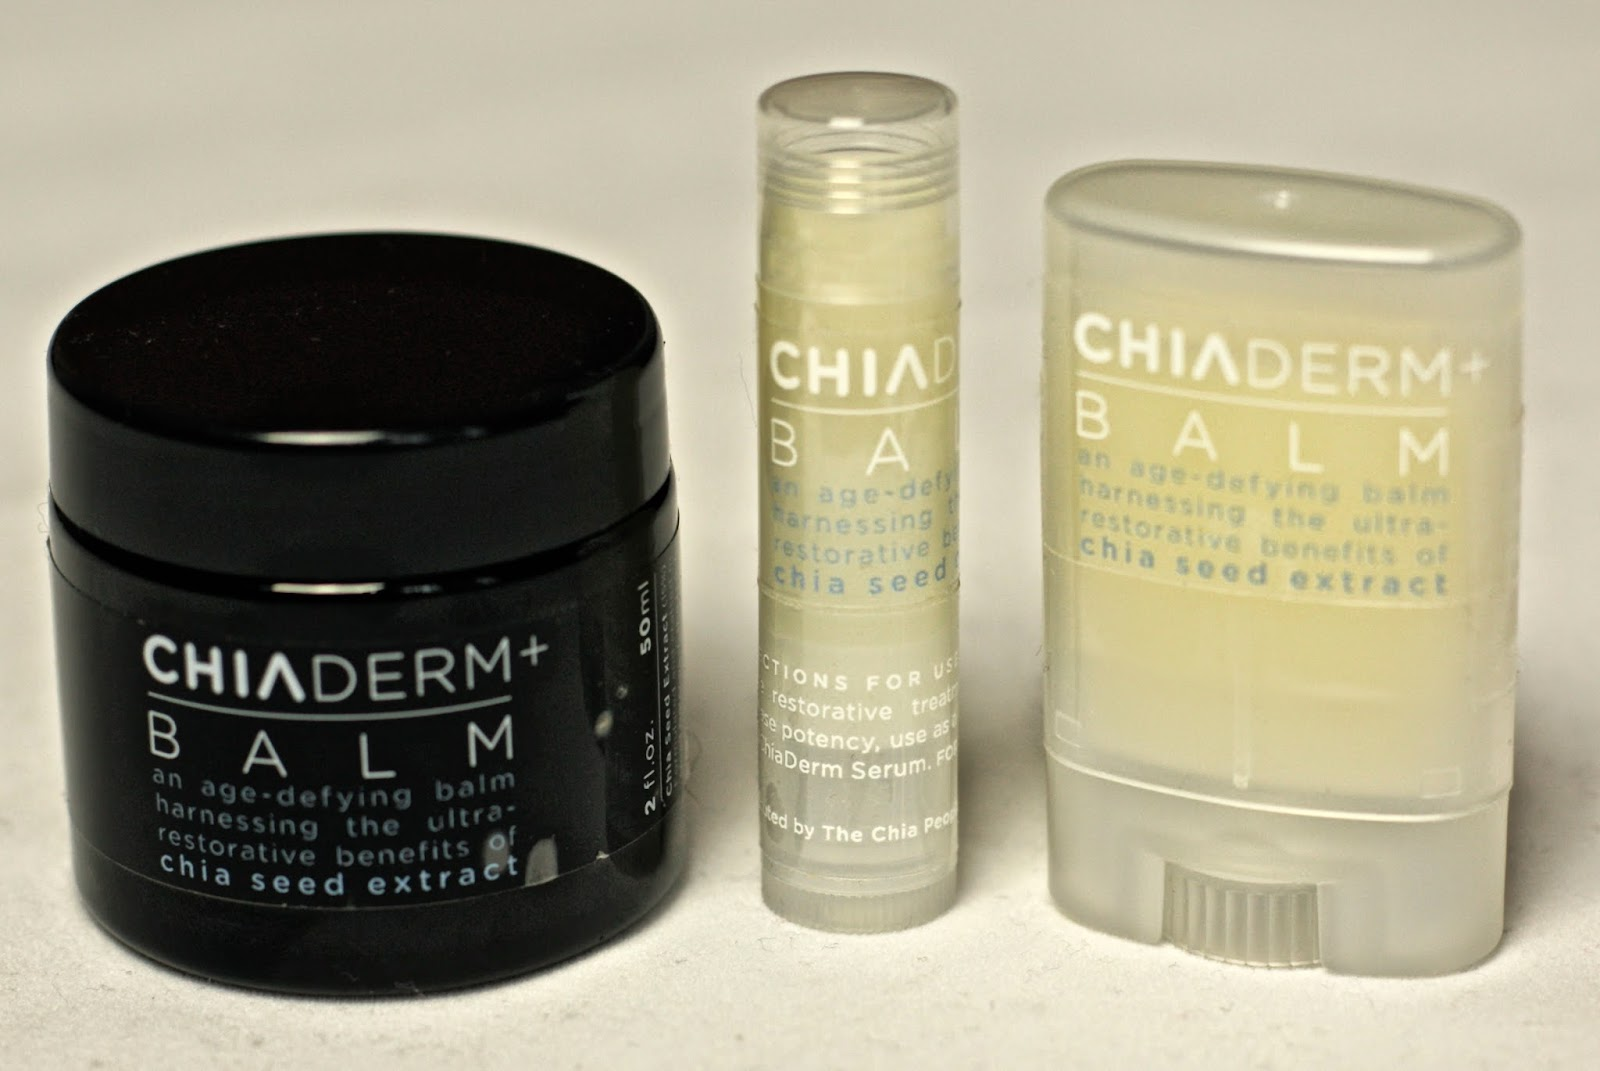 Lips balm set by ChiaDerm+